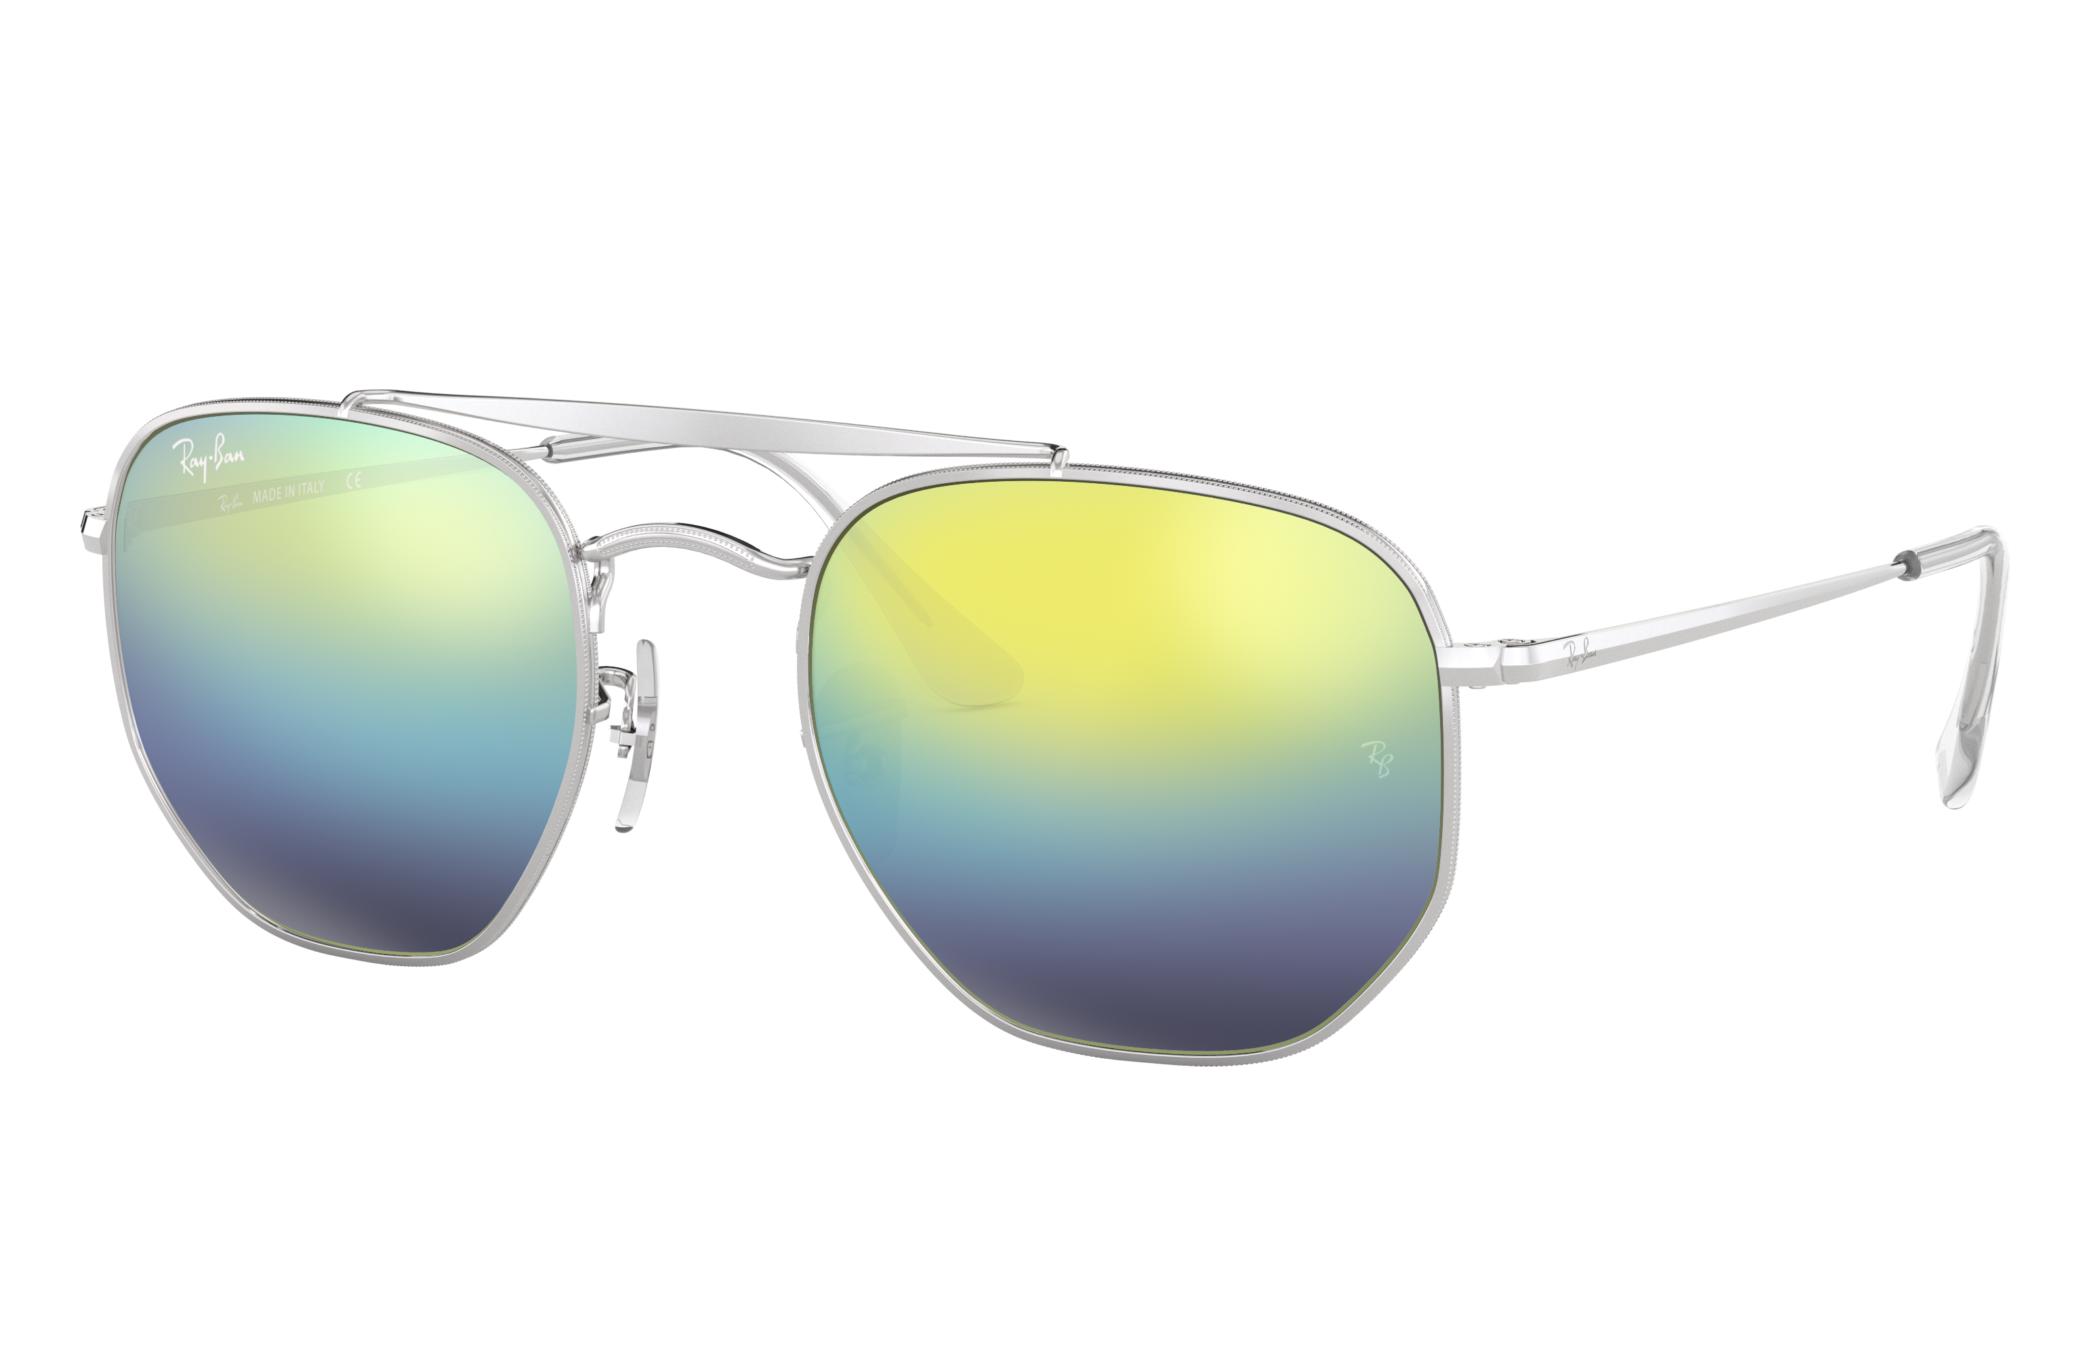 Ray-Ban Marshal Silver, Blue Lenses - RB3648